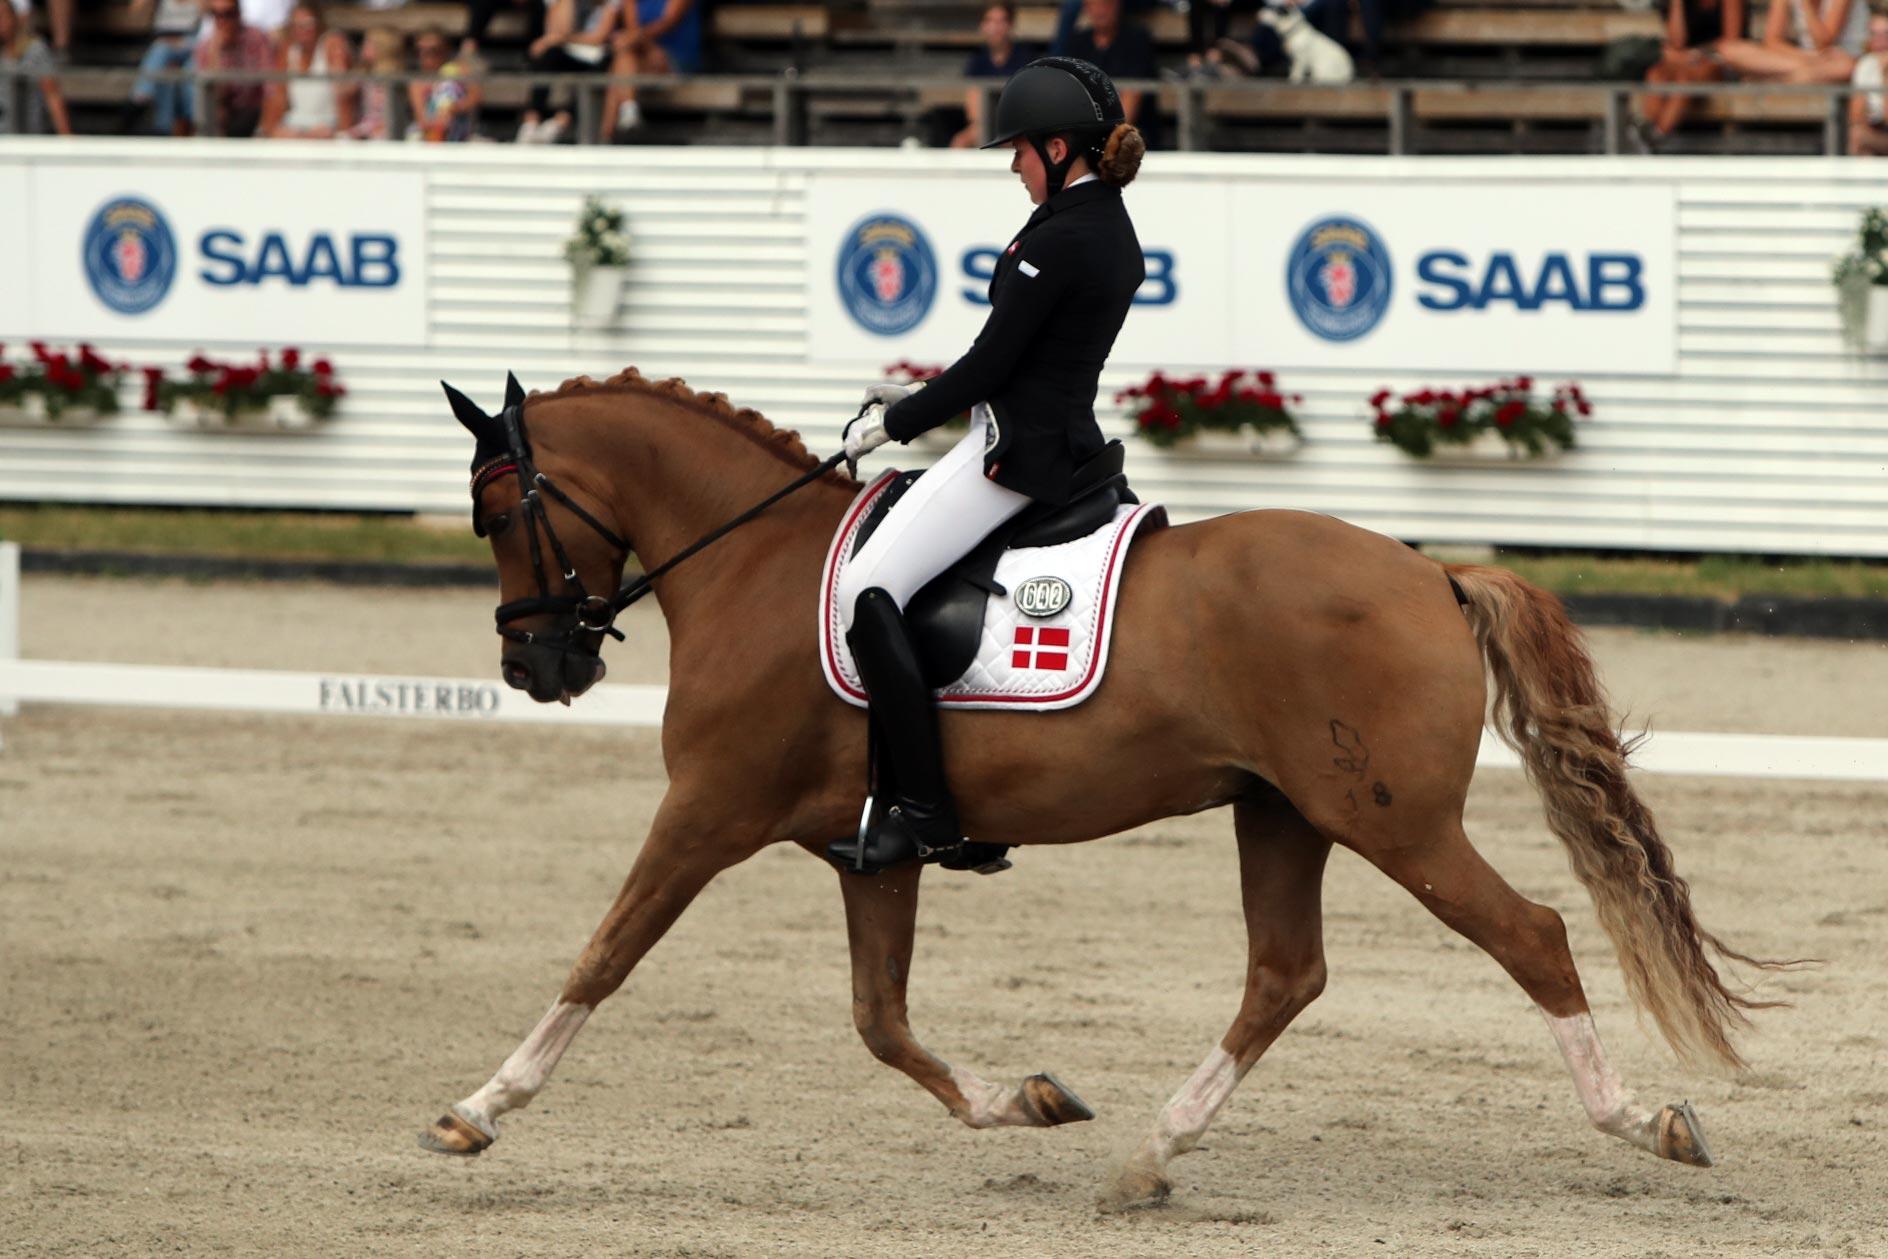 Mathilde Kalstrup Jensen - Cake Royal (val f-11 e Casino Royale KWE, uppf Sabine Goldberg) 70,958%